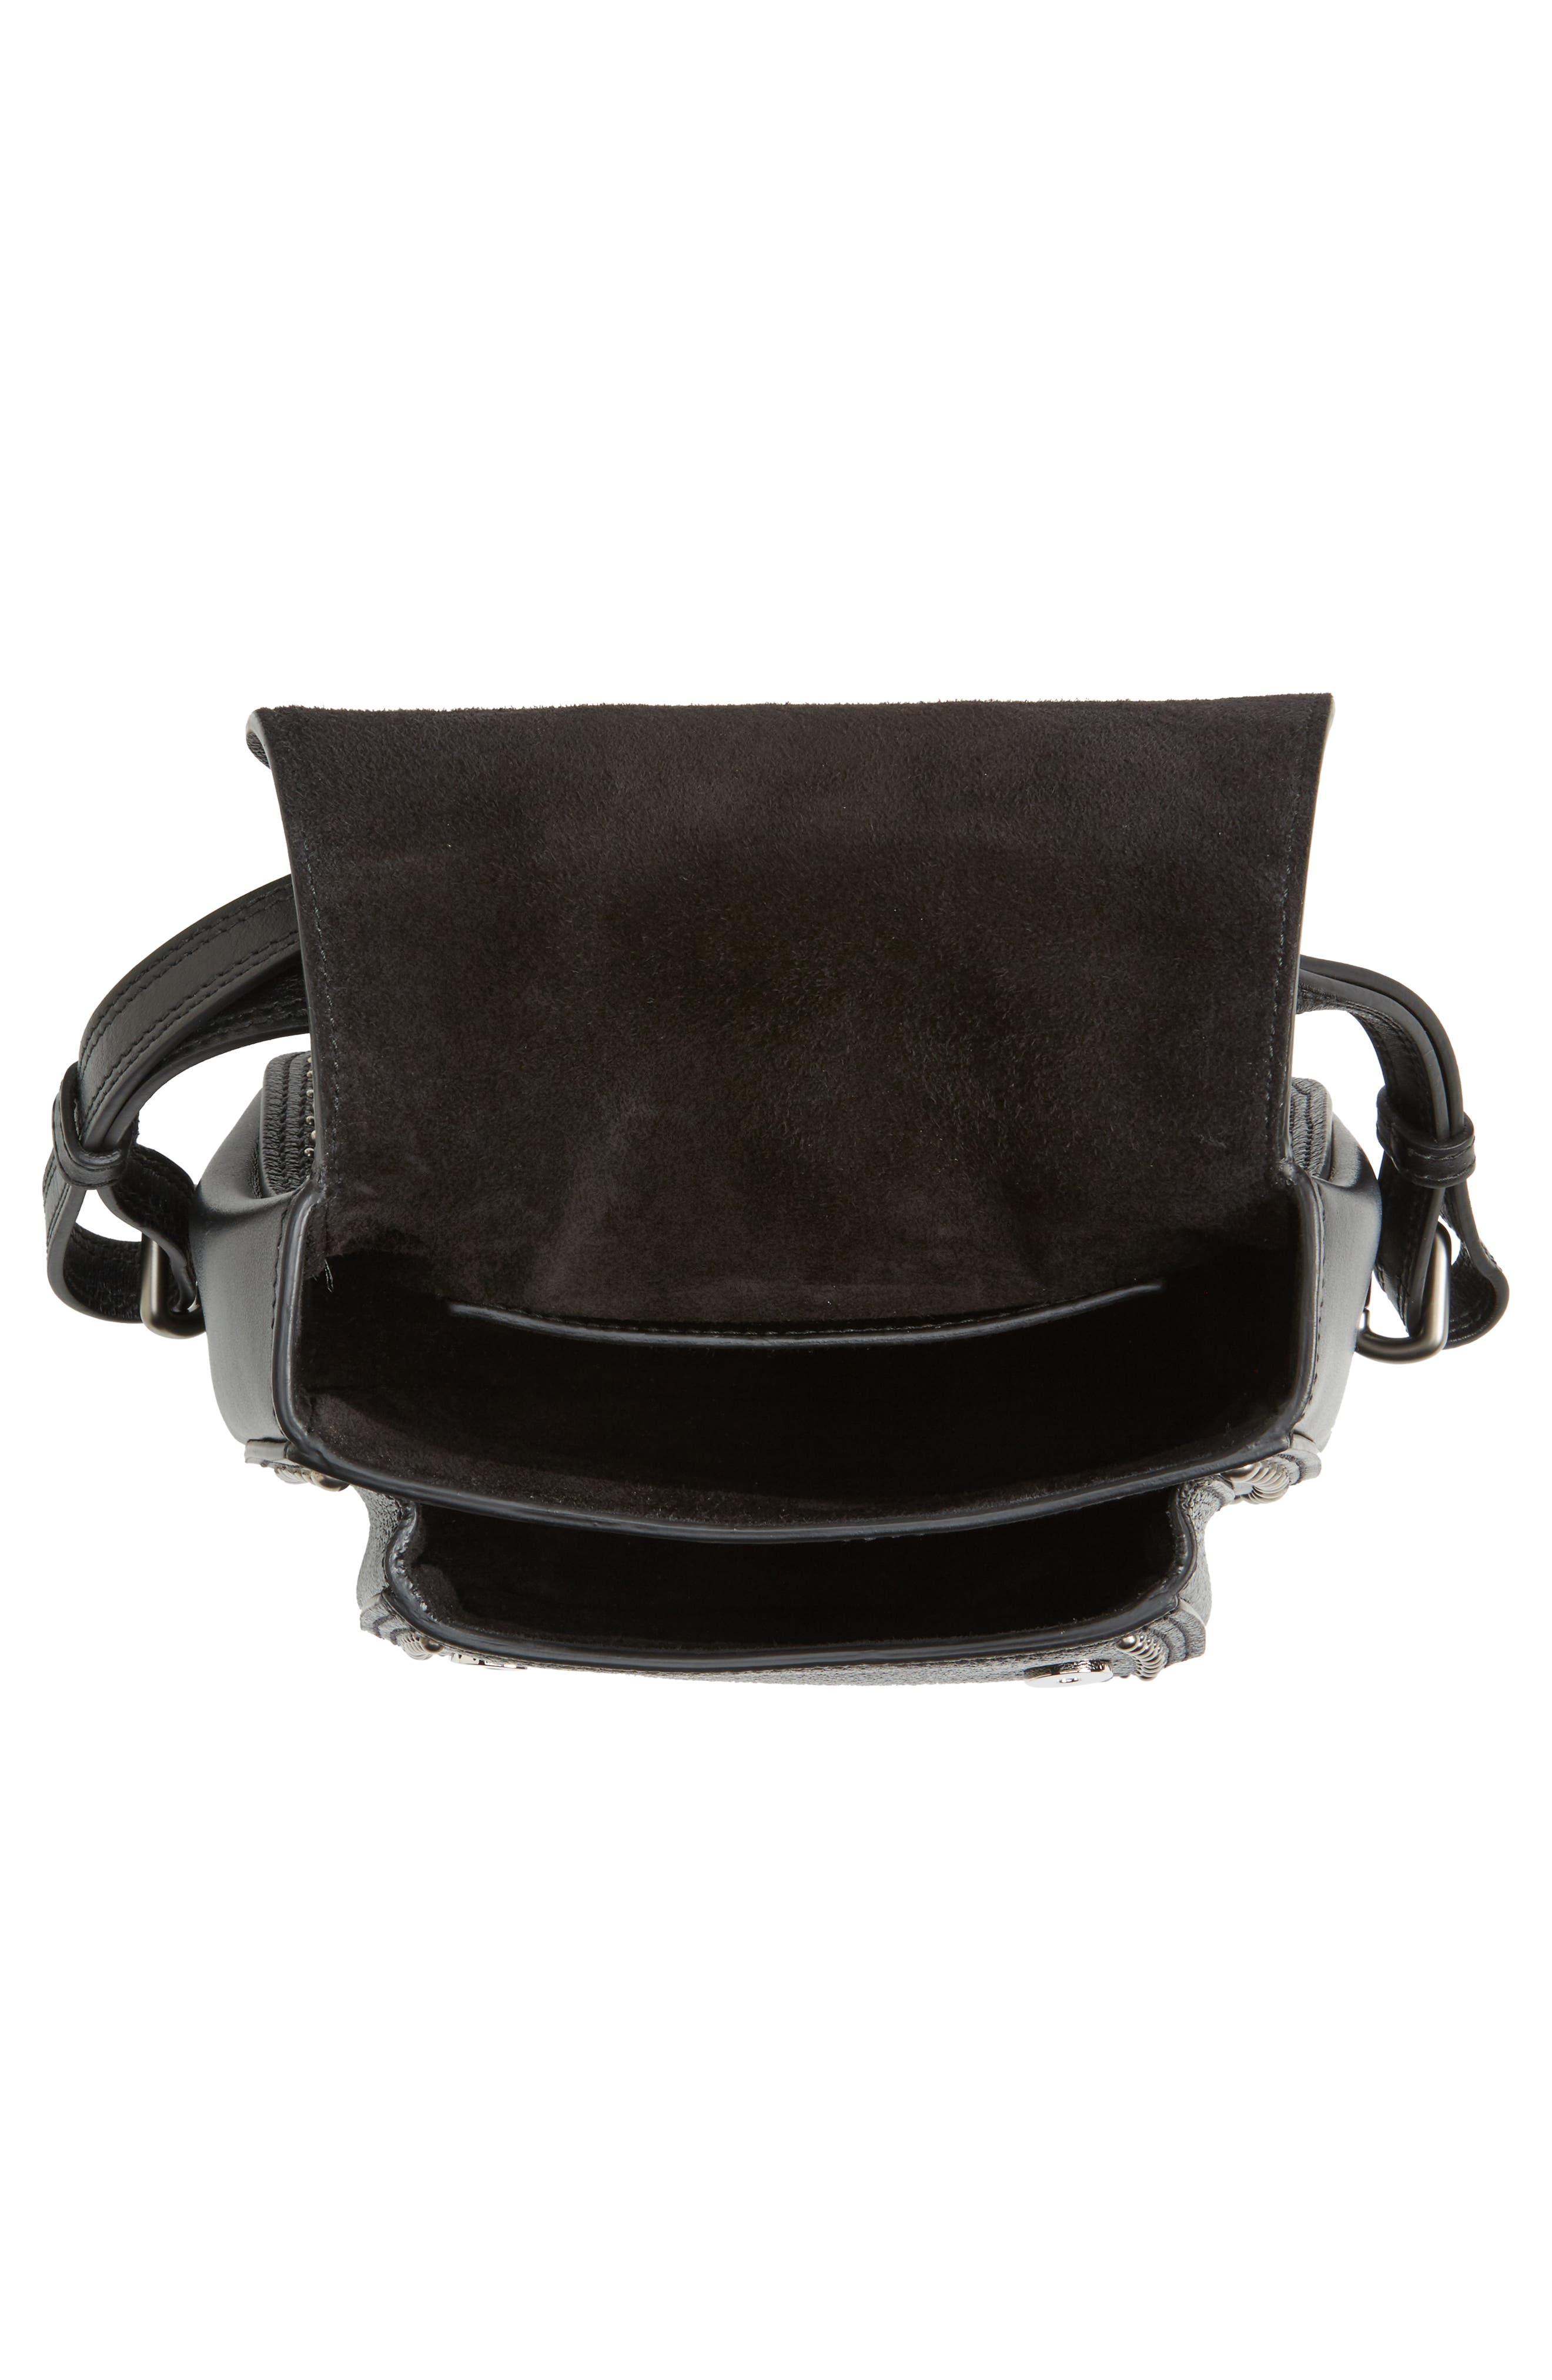 Dahlia Leather Shoulder Bag,                             Alternate thumbnail 4, color,                             Nero